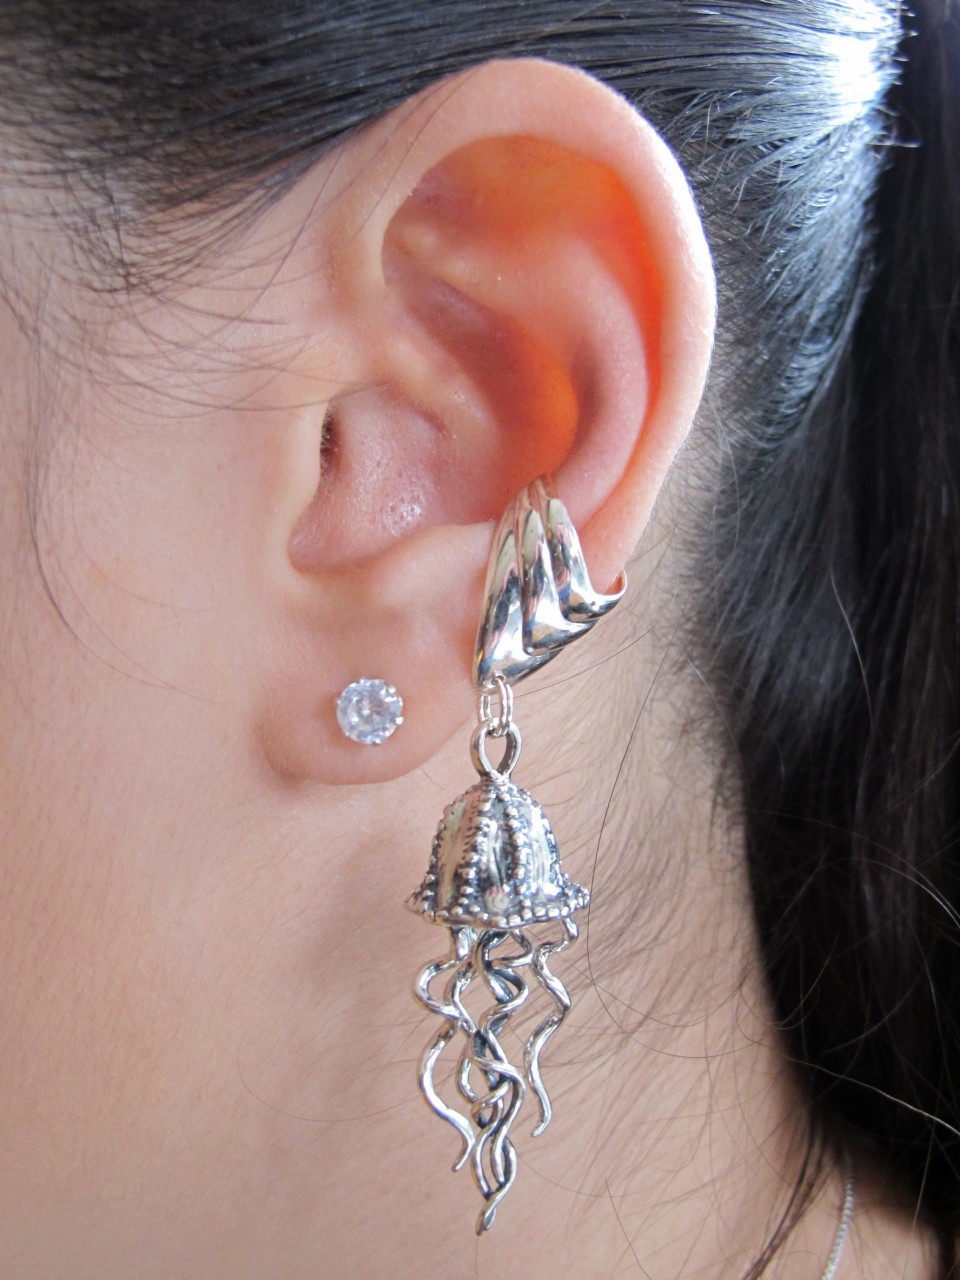 jellyfish ear cuff silver marty magic store. Black Bedroom Furniture Sets. Home Design Ideas